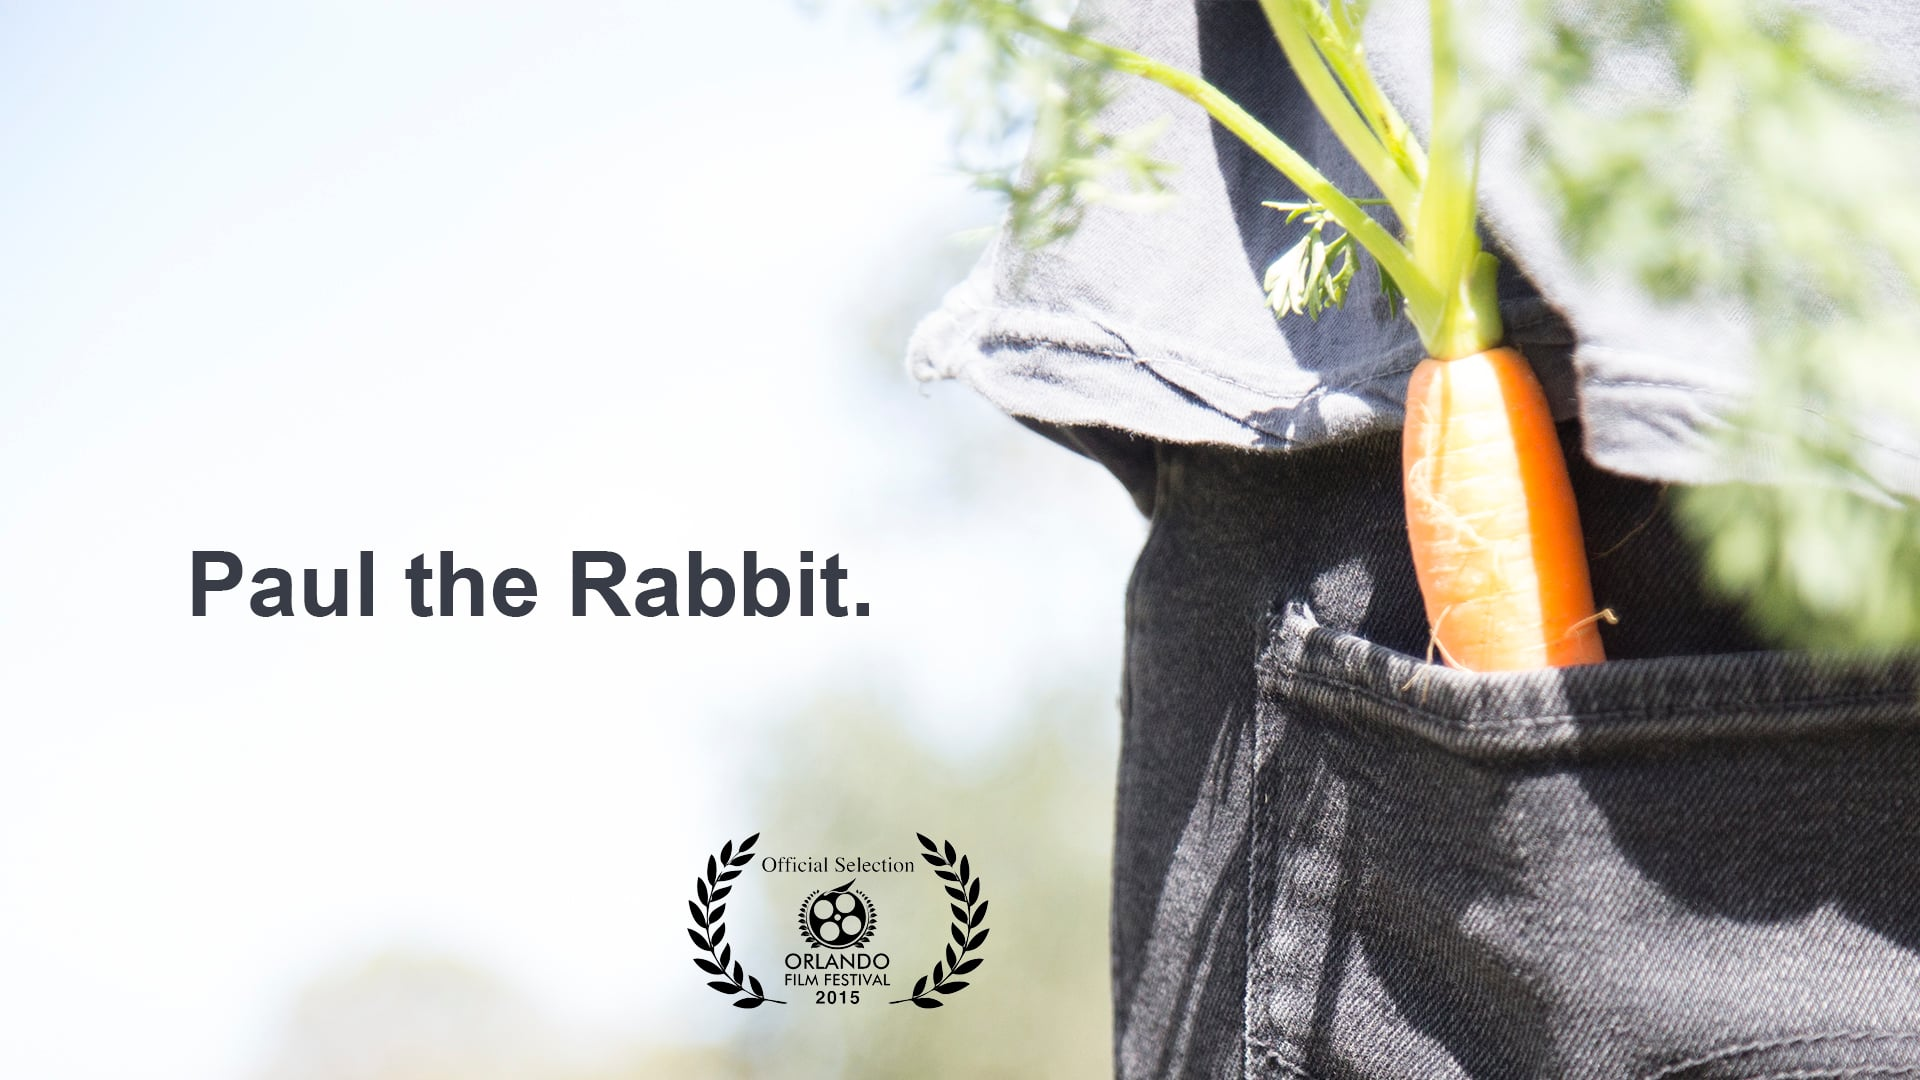 Paul the Rabbit